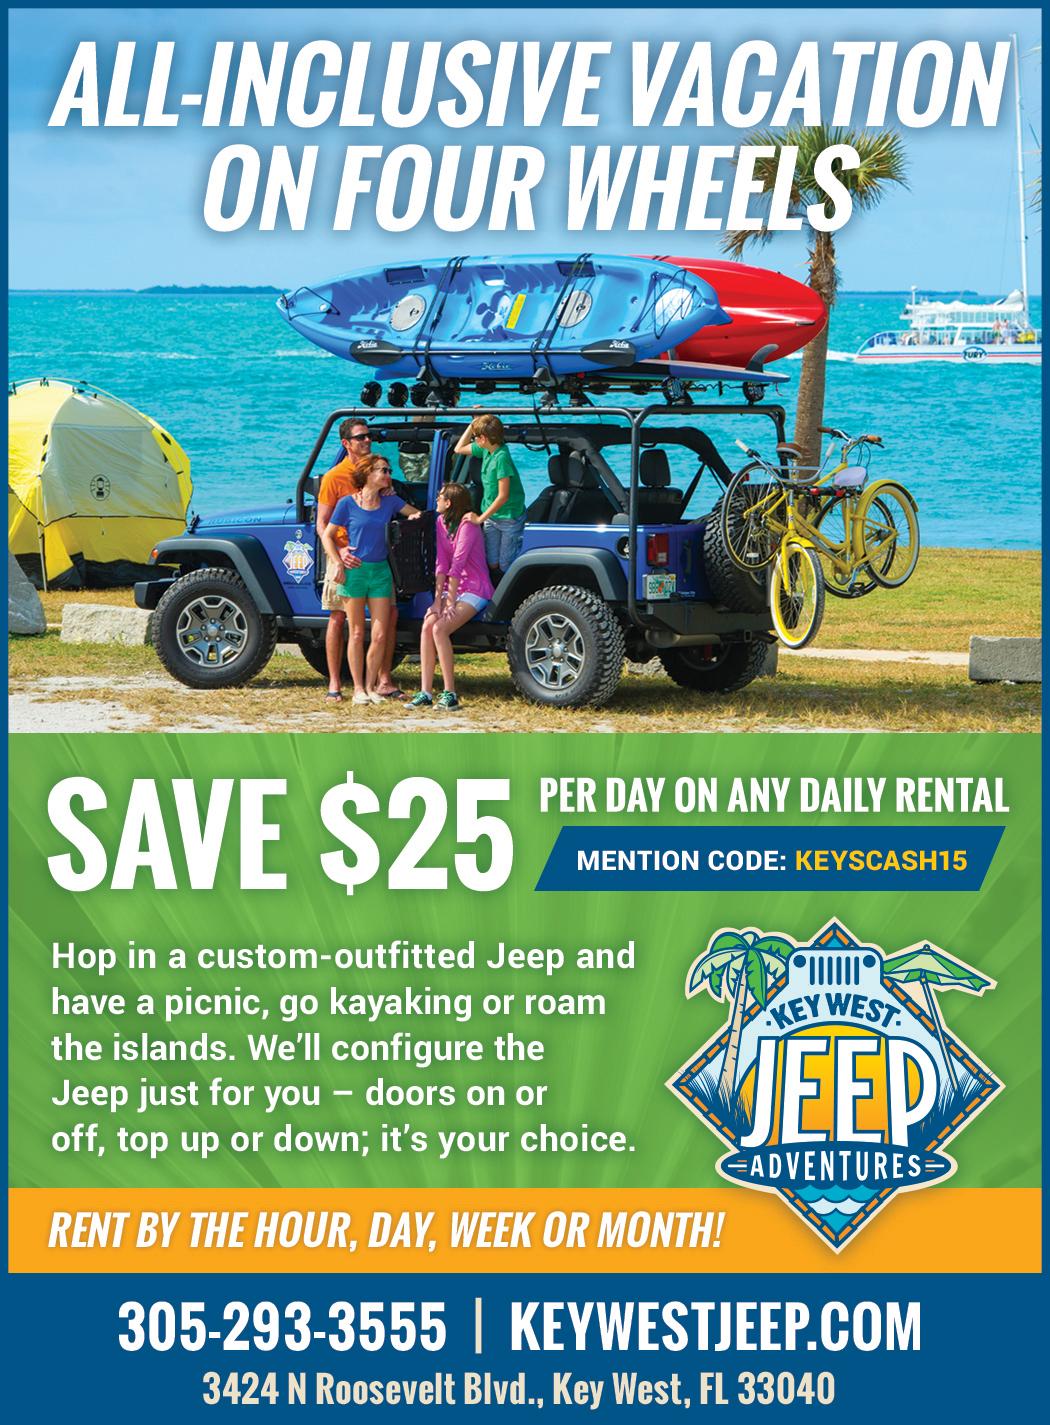 Florida coupons and discounts